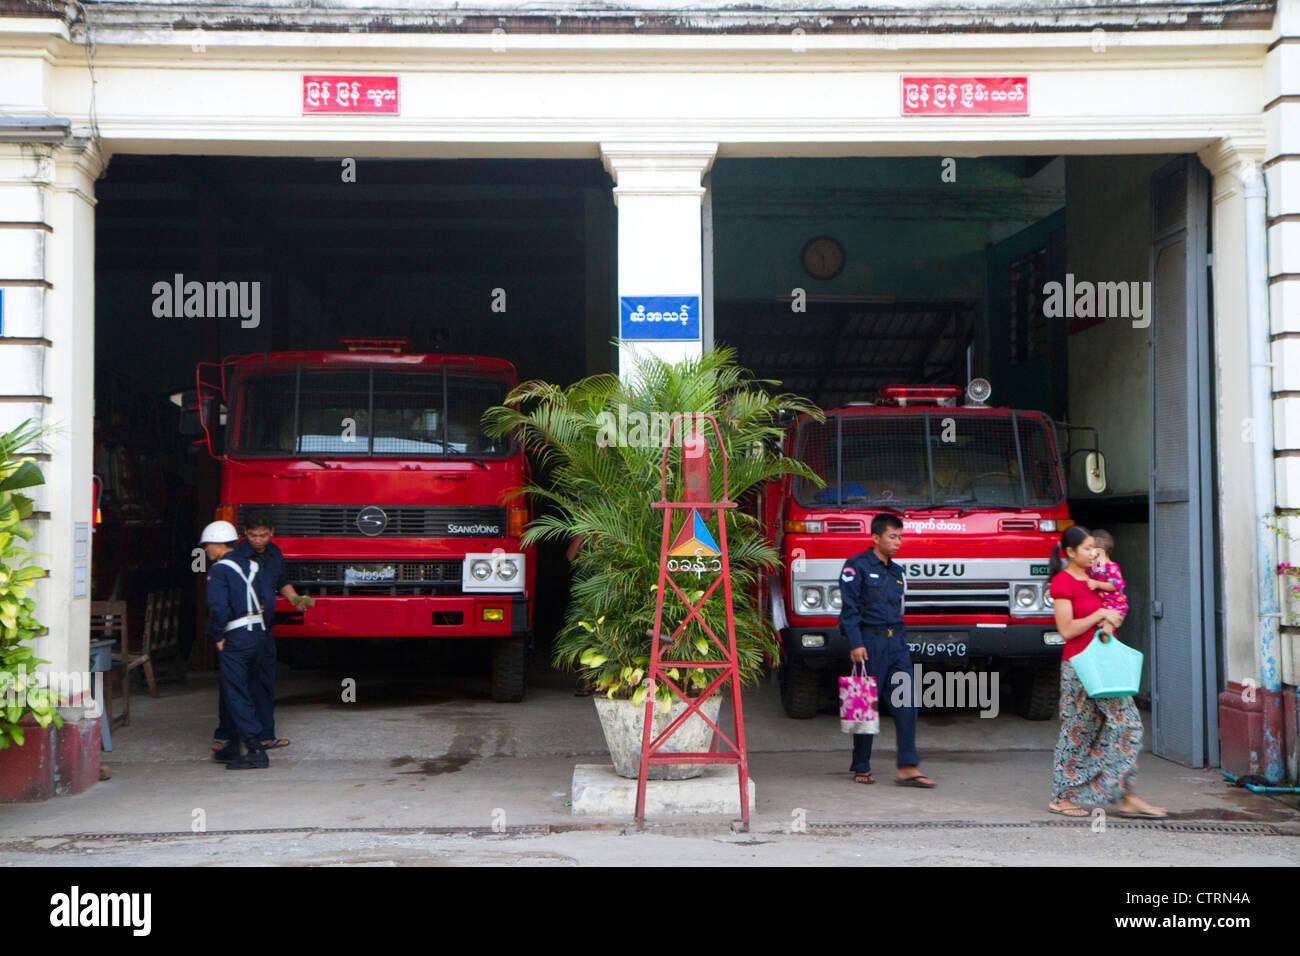 Fire station in (Rangoon) Yangon, (Burma) Myanmar. - Stock Image